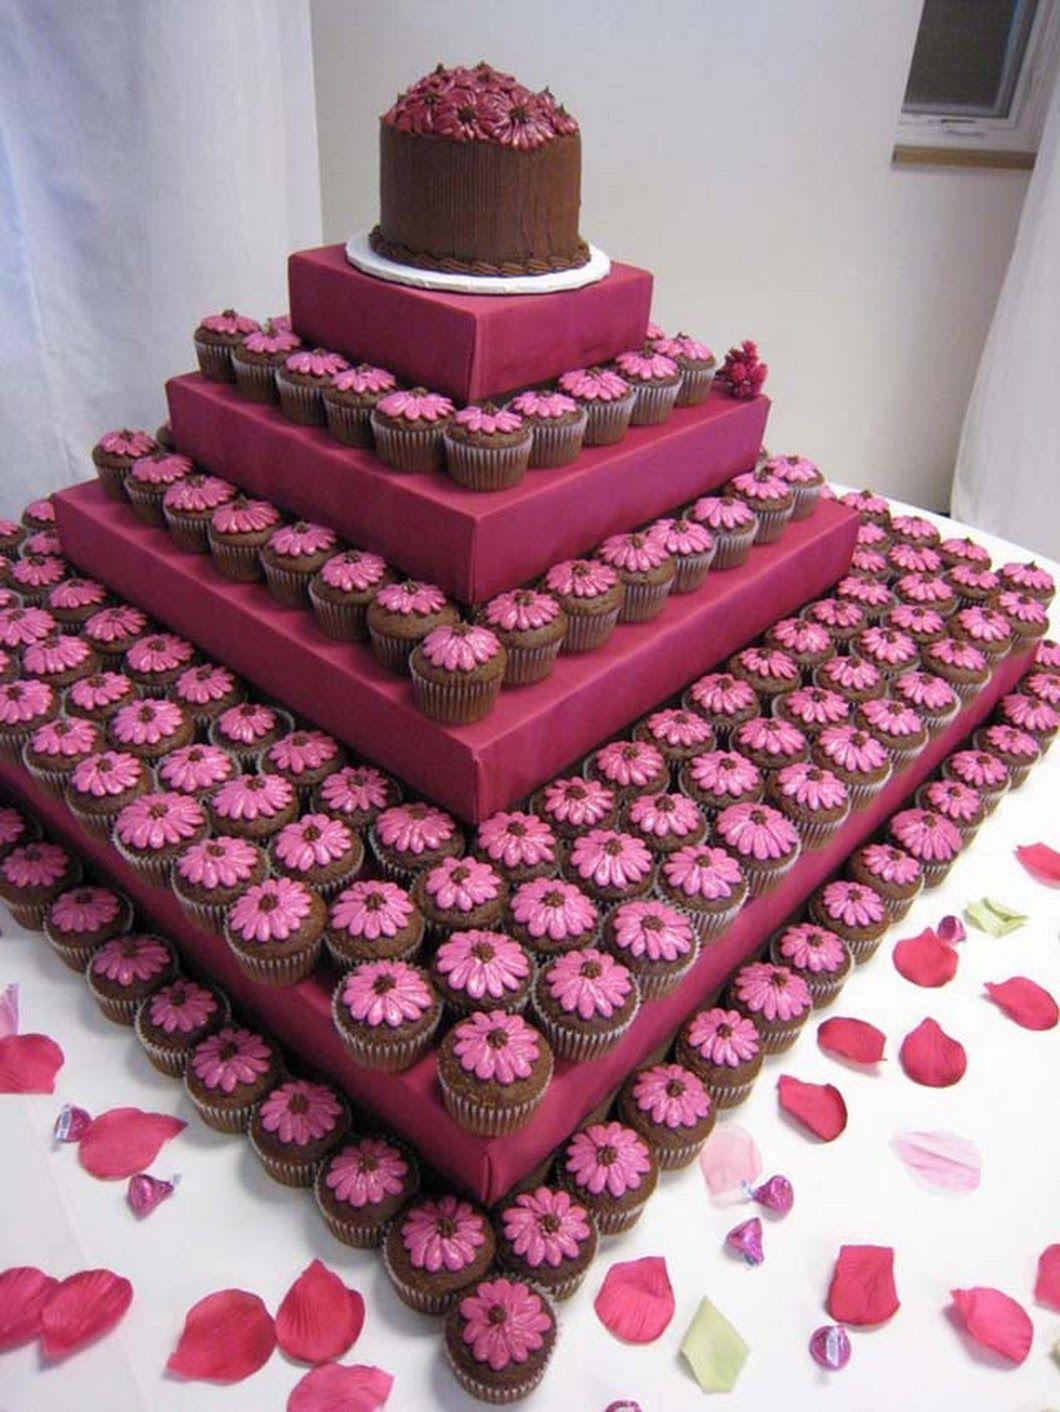 Best wedding cupcake ideas read more goowjkwdp